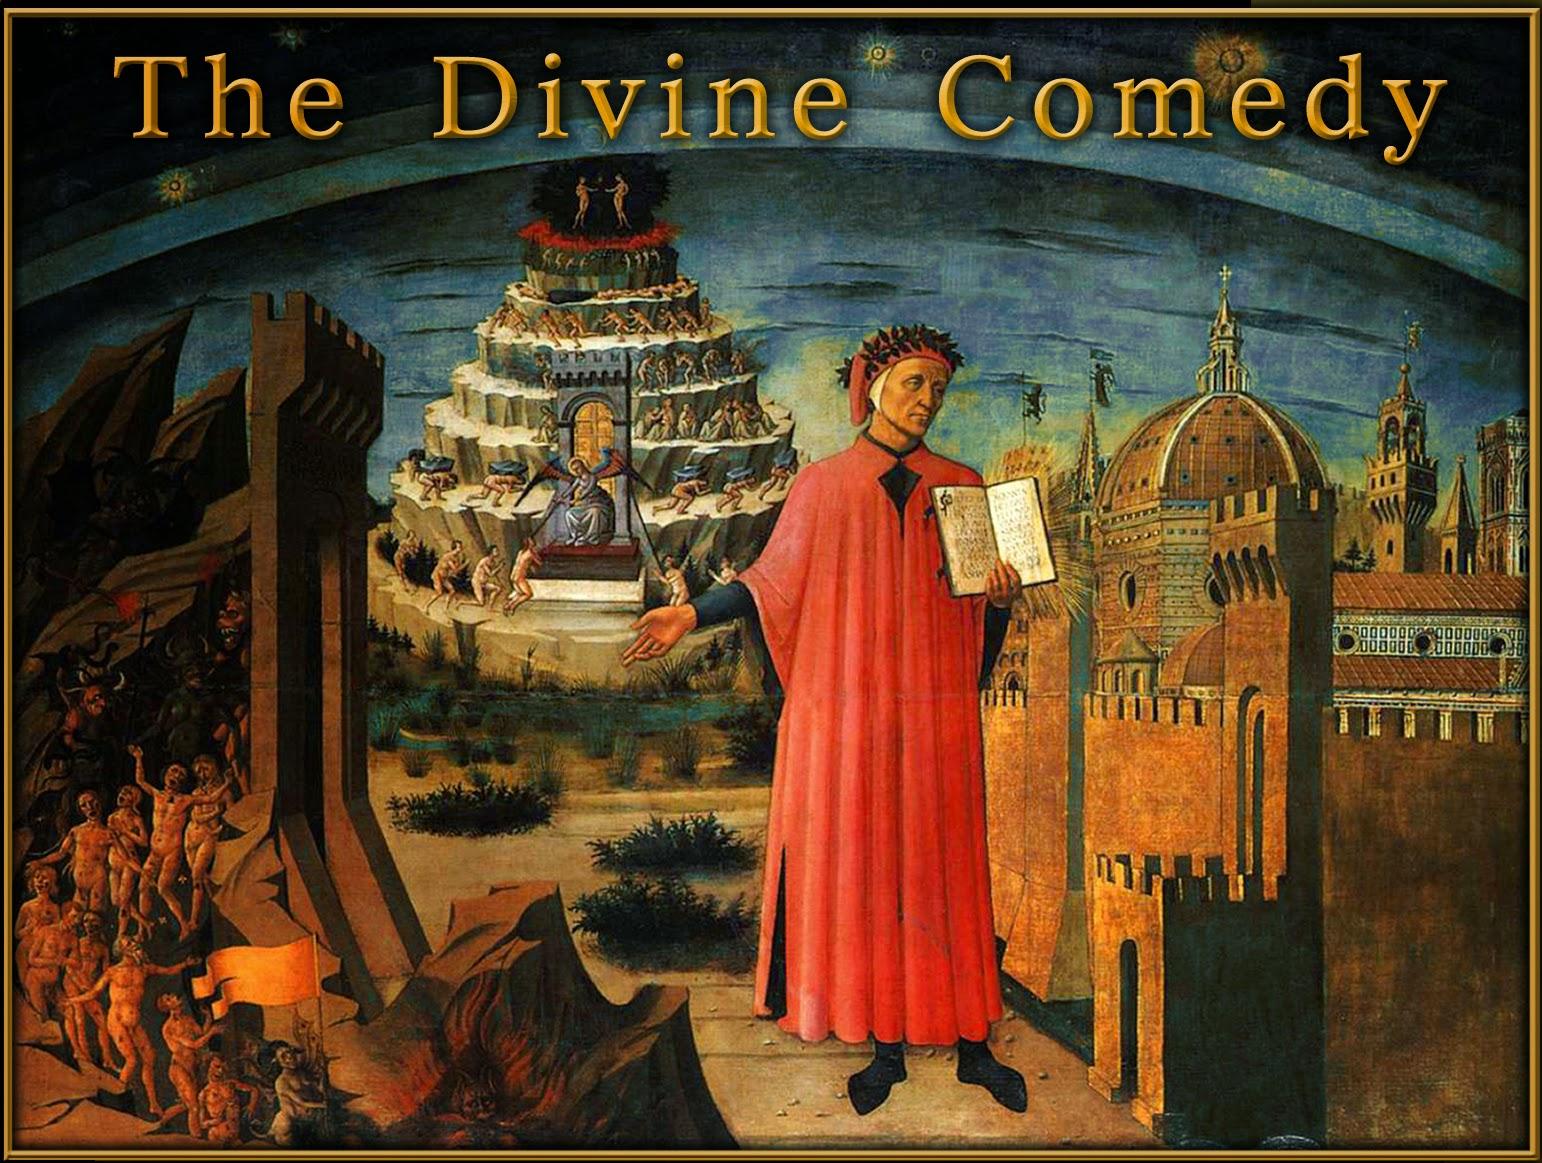 http://www.dantealighieri.name/images/DivineComedyFresco.jpg